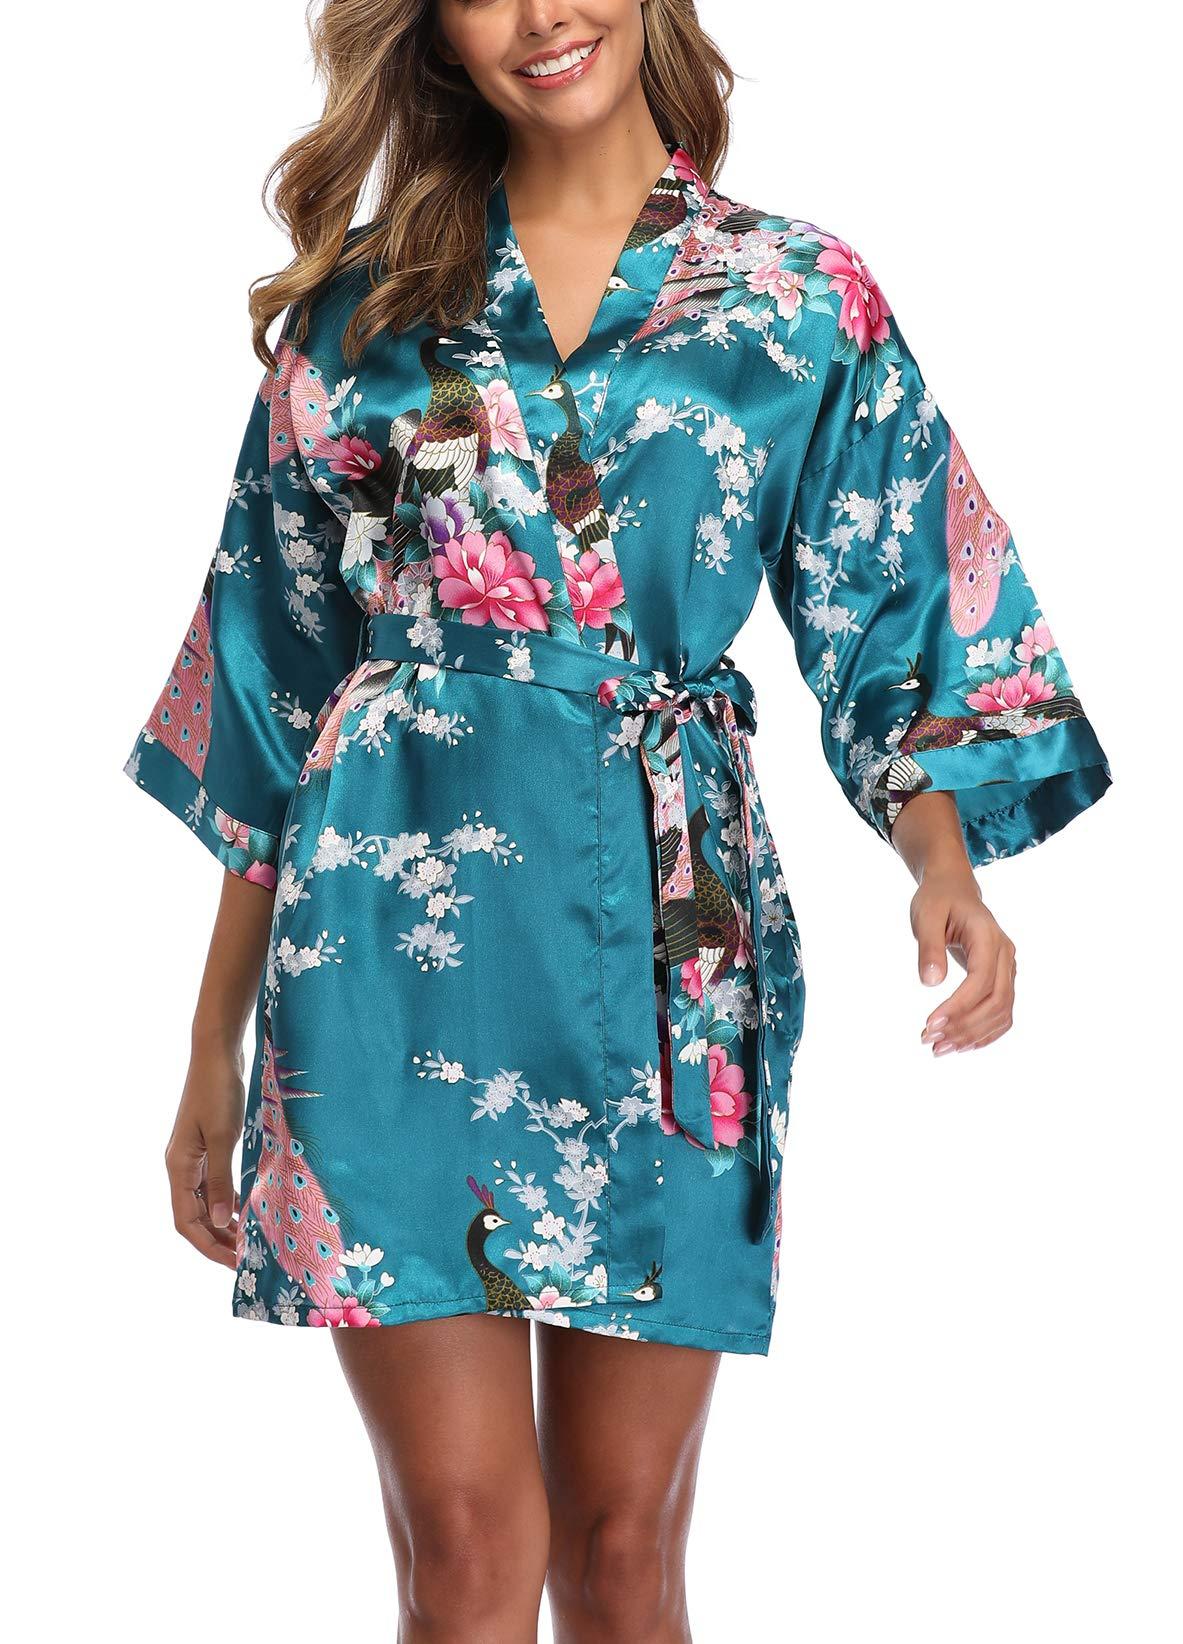 UrHot Womens Short Floral Kimono Robe Peacock and Blossom Bathrobe for Wedding Party